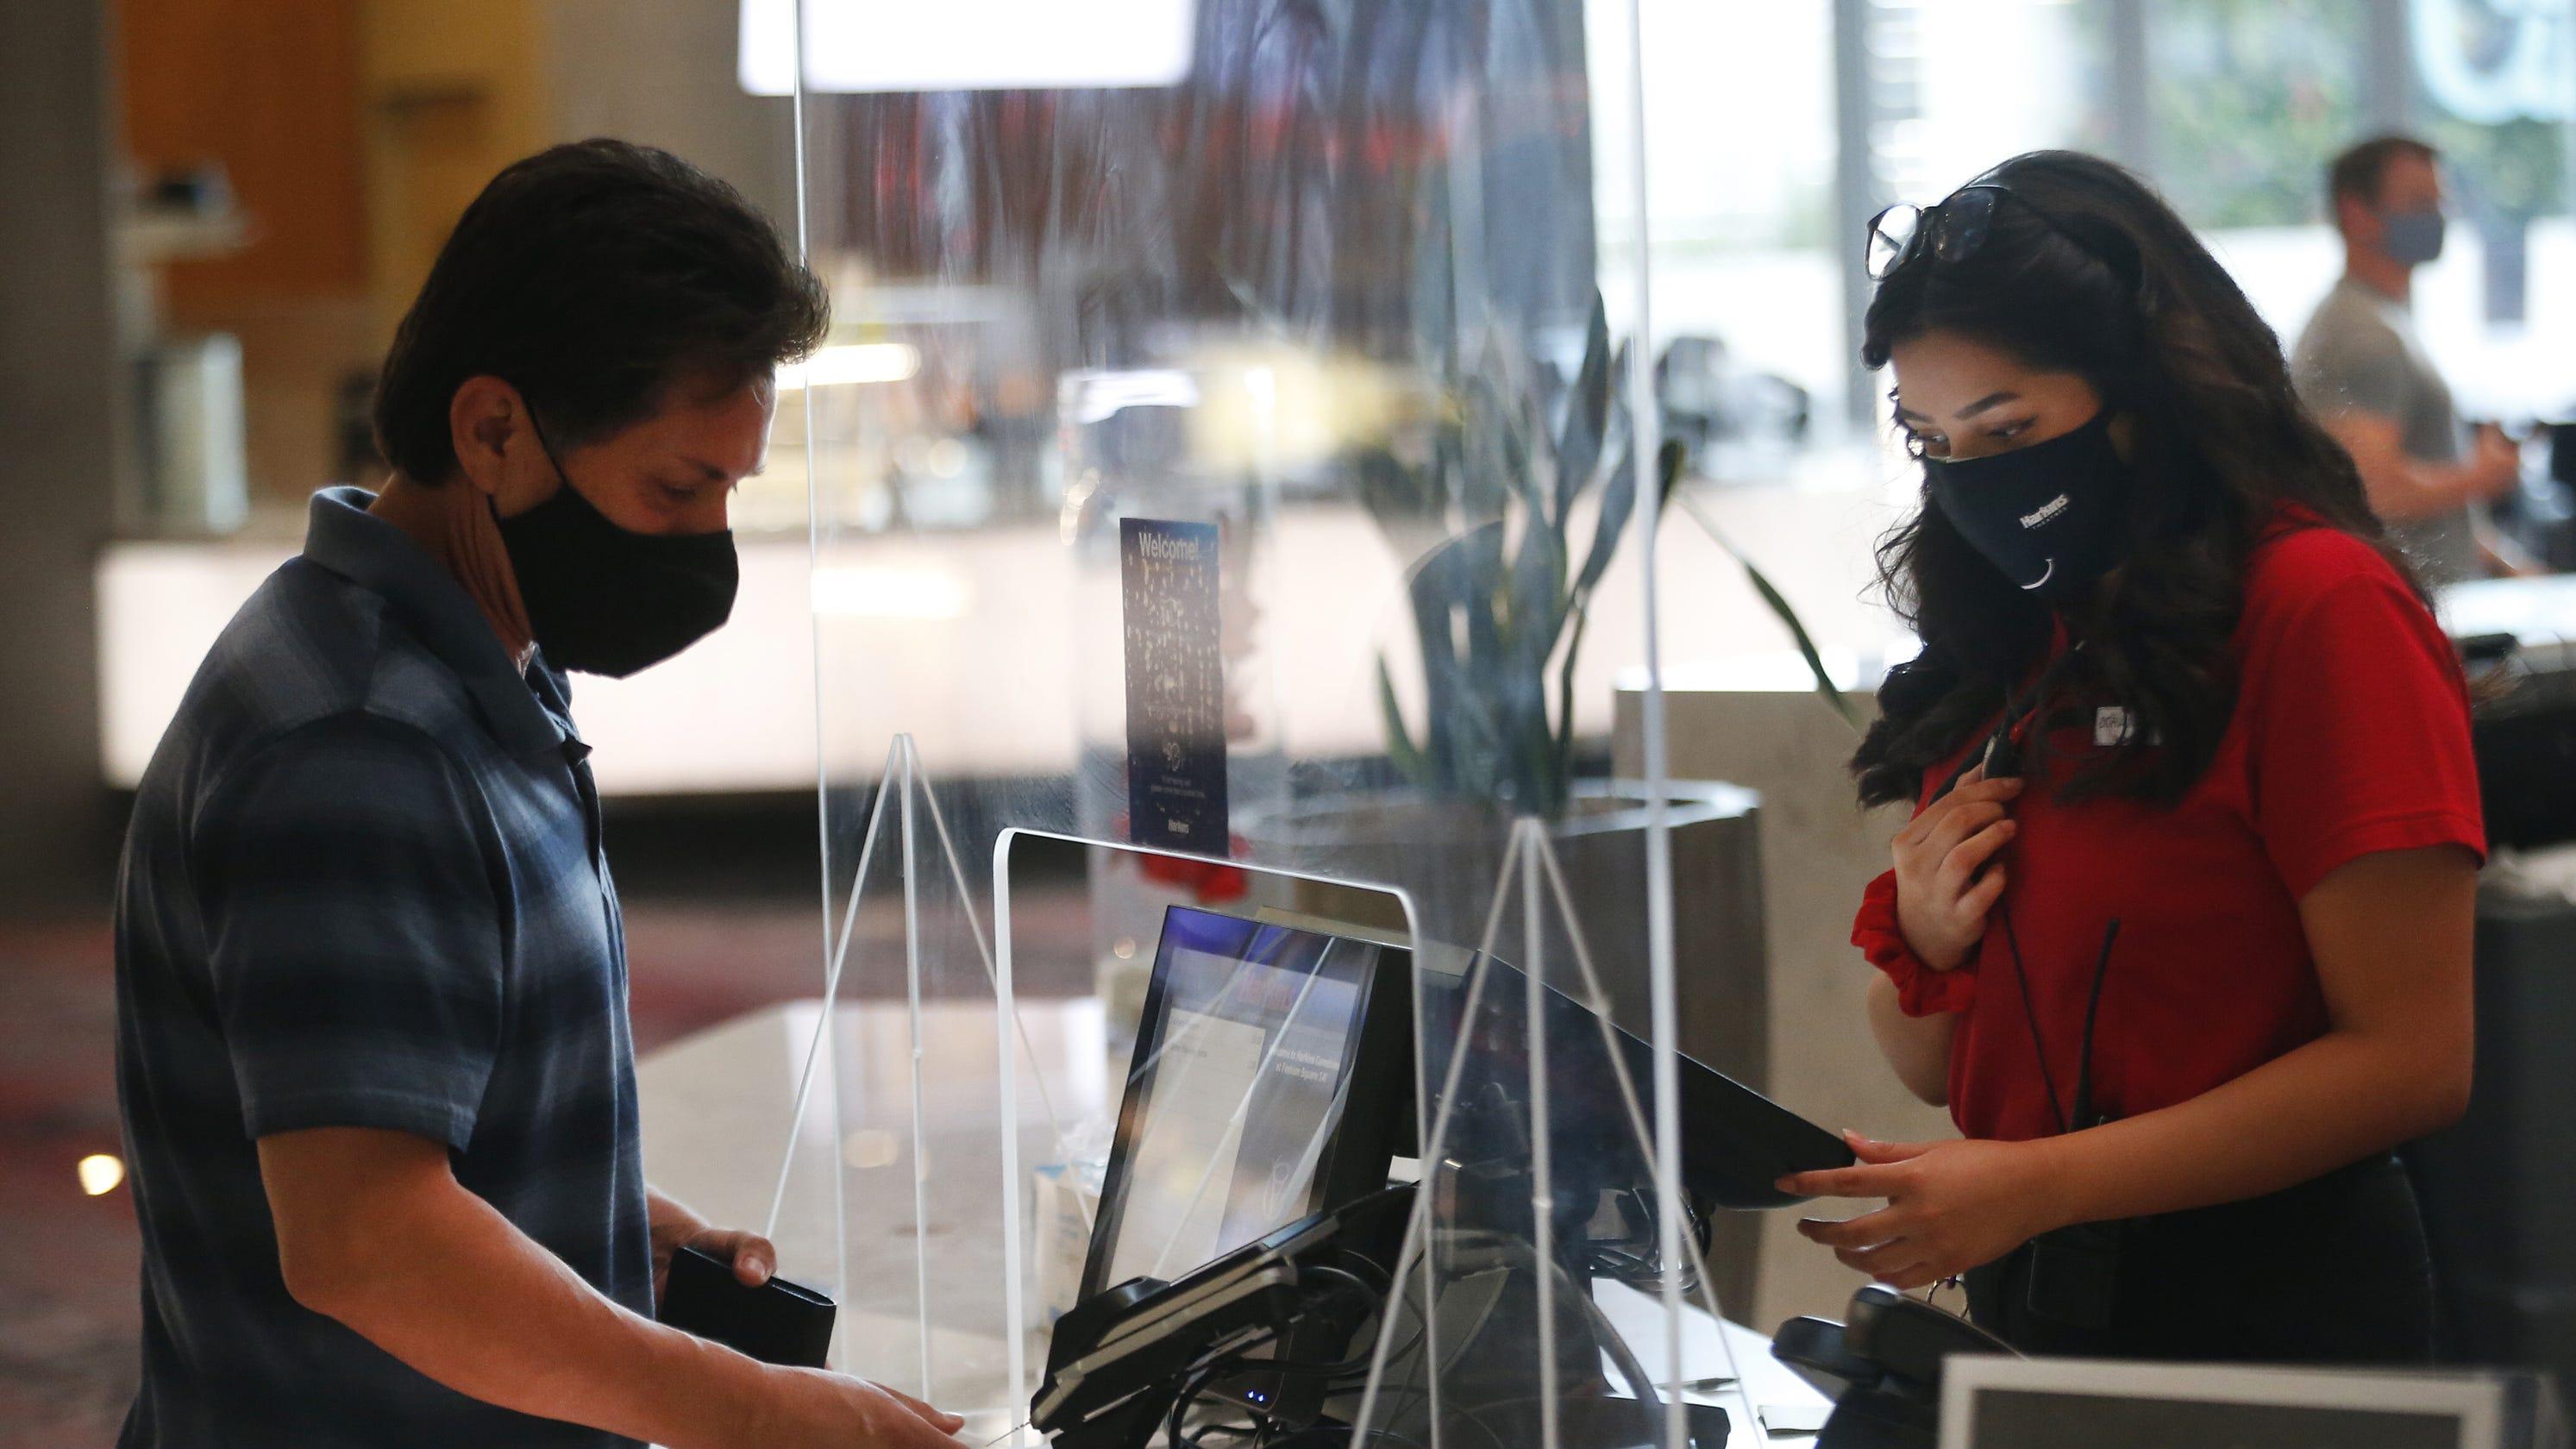 Scottsdale mayor rescinds mask order, but Maricopa County mandate remains